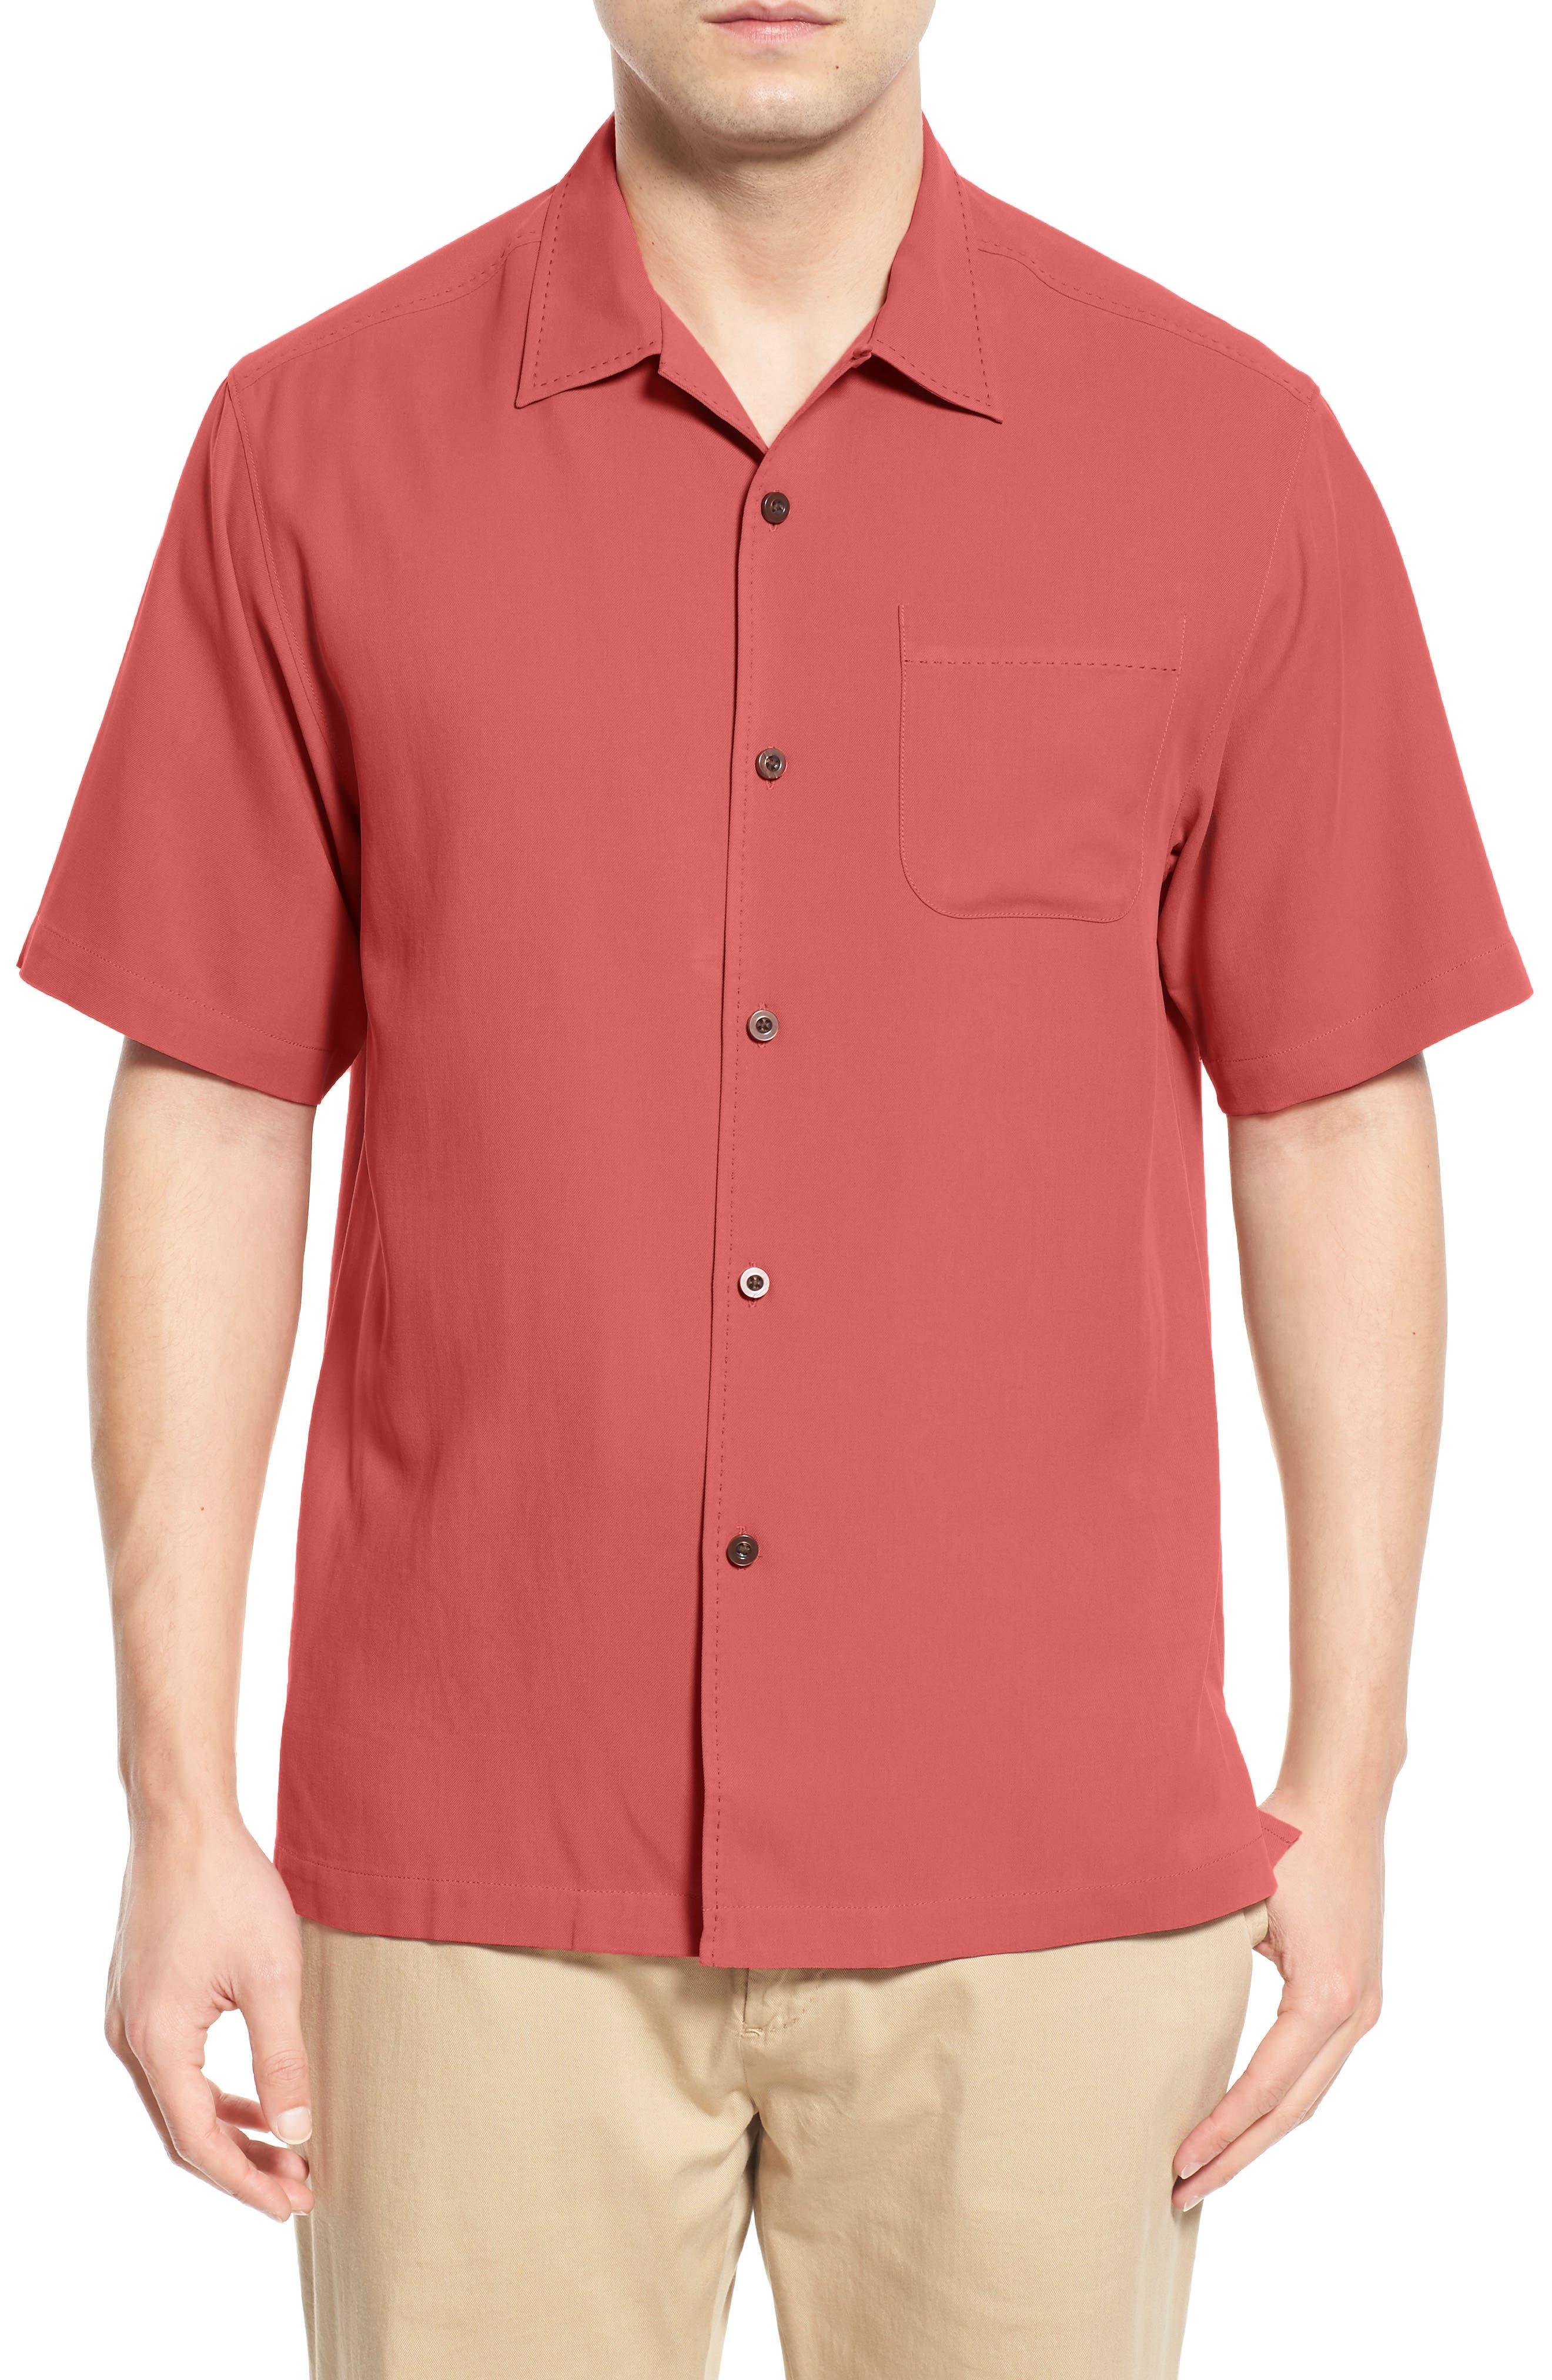 'Catalina Twill' Original Fit Silk Camp Shirt,                         Main,                         color, Coral Reef